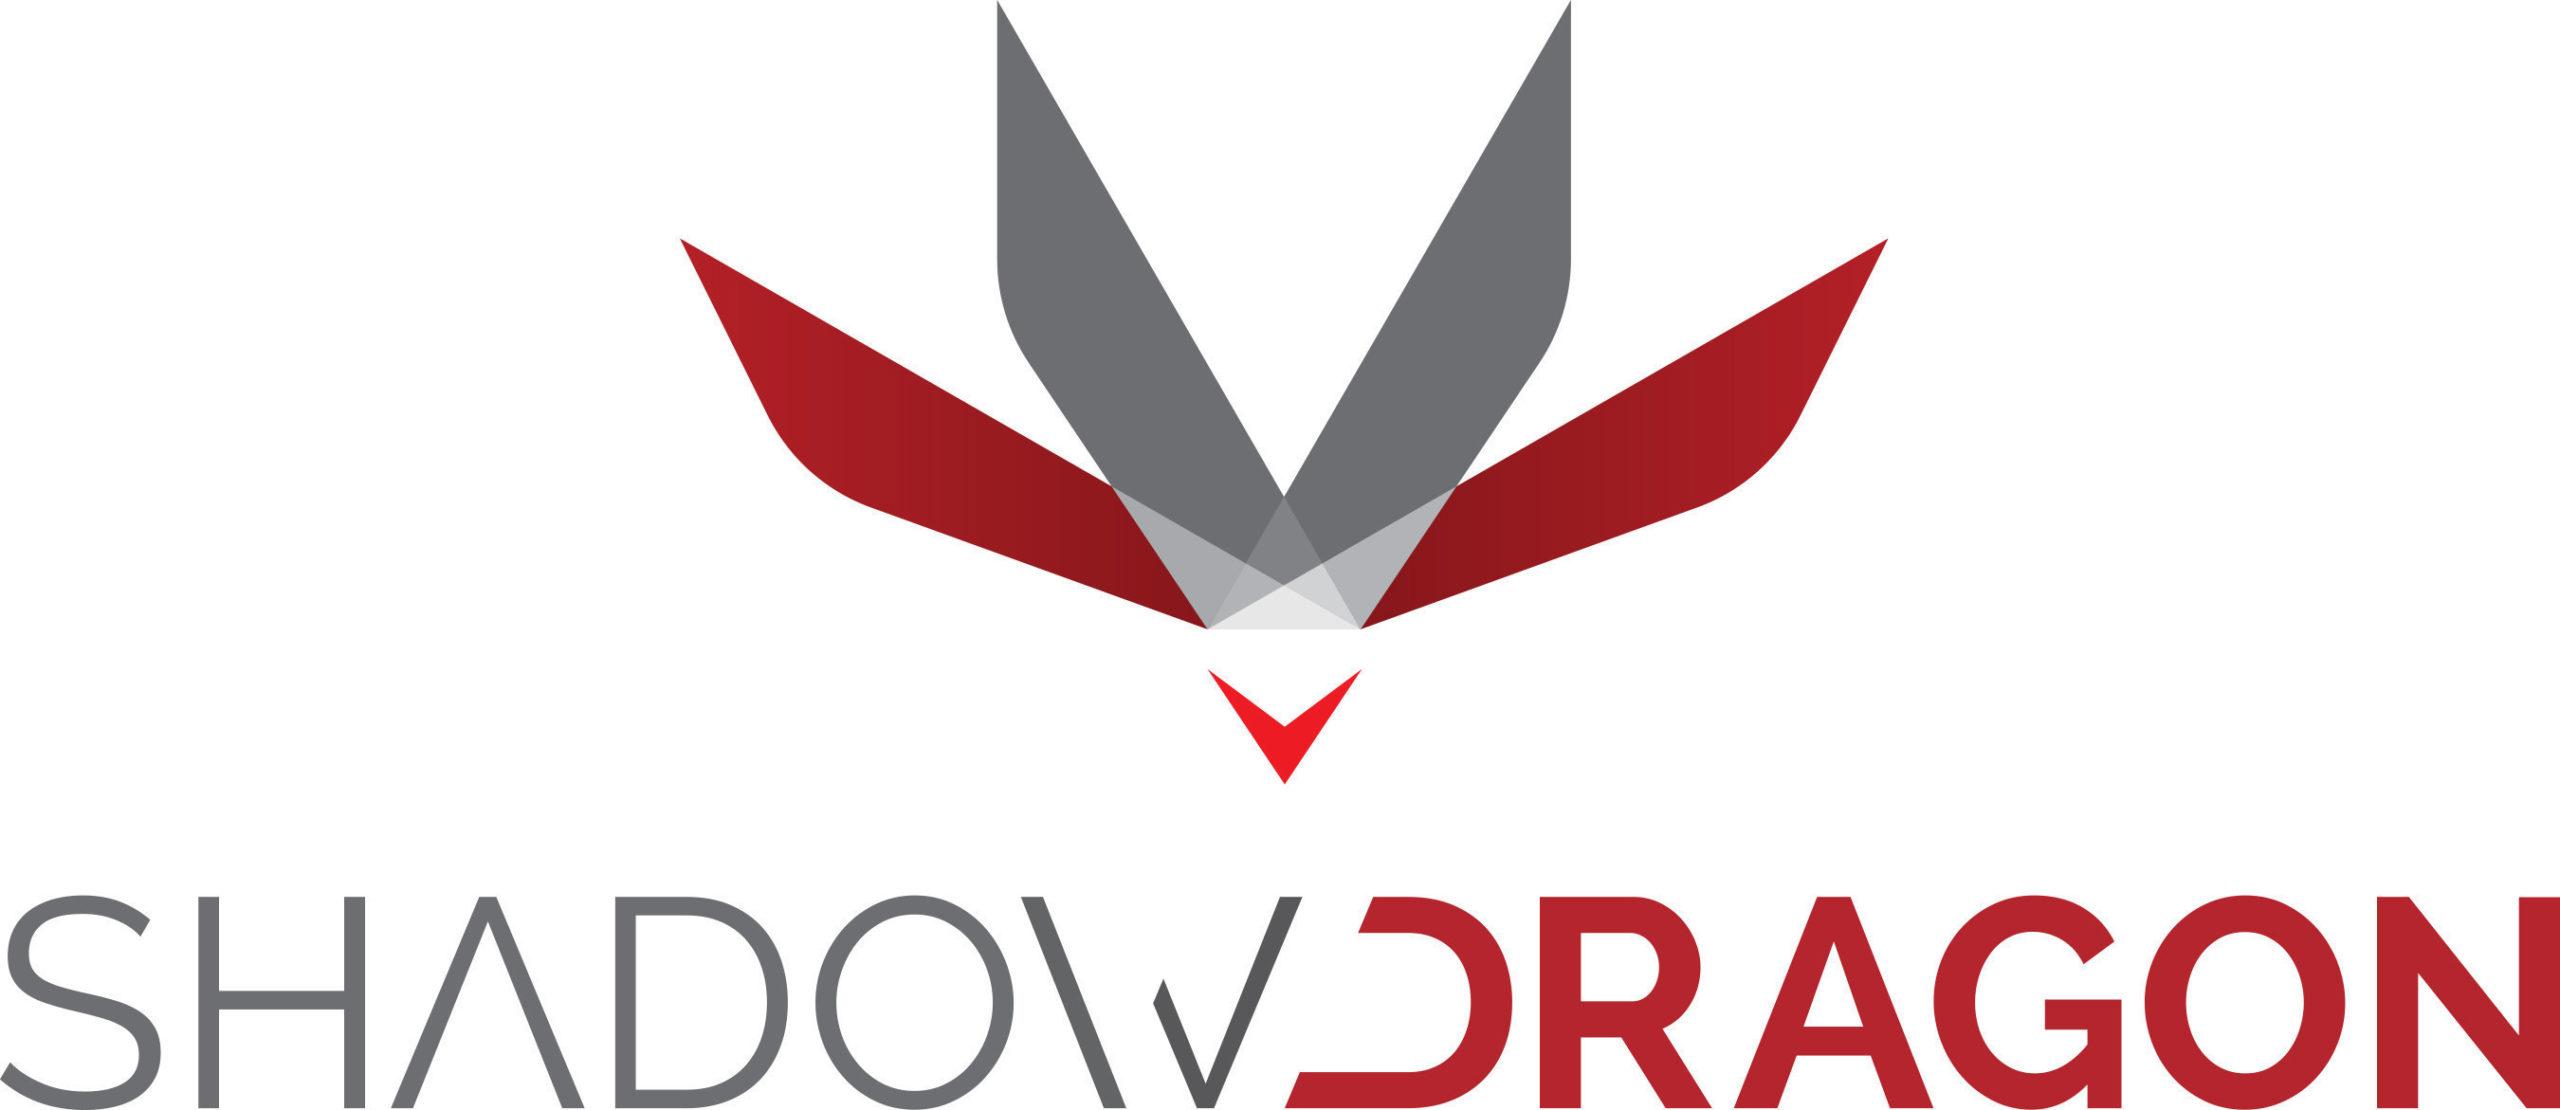 https://decodedstrategies.com/wp-content/uploads/2021/06/shadow-dragon-scaled.jpeg